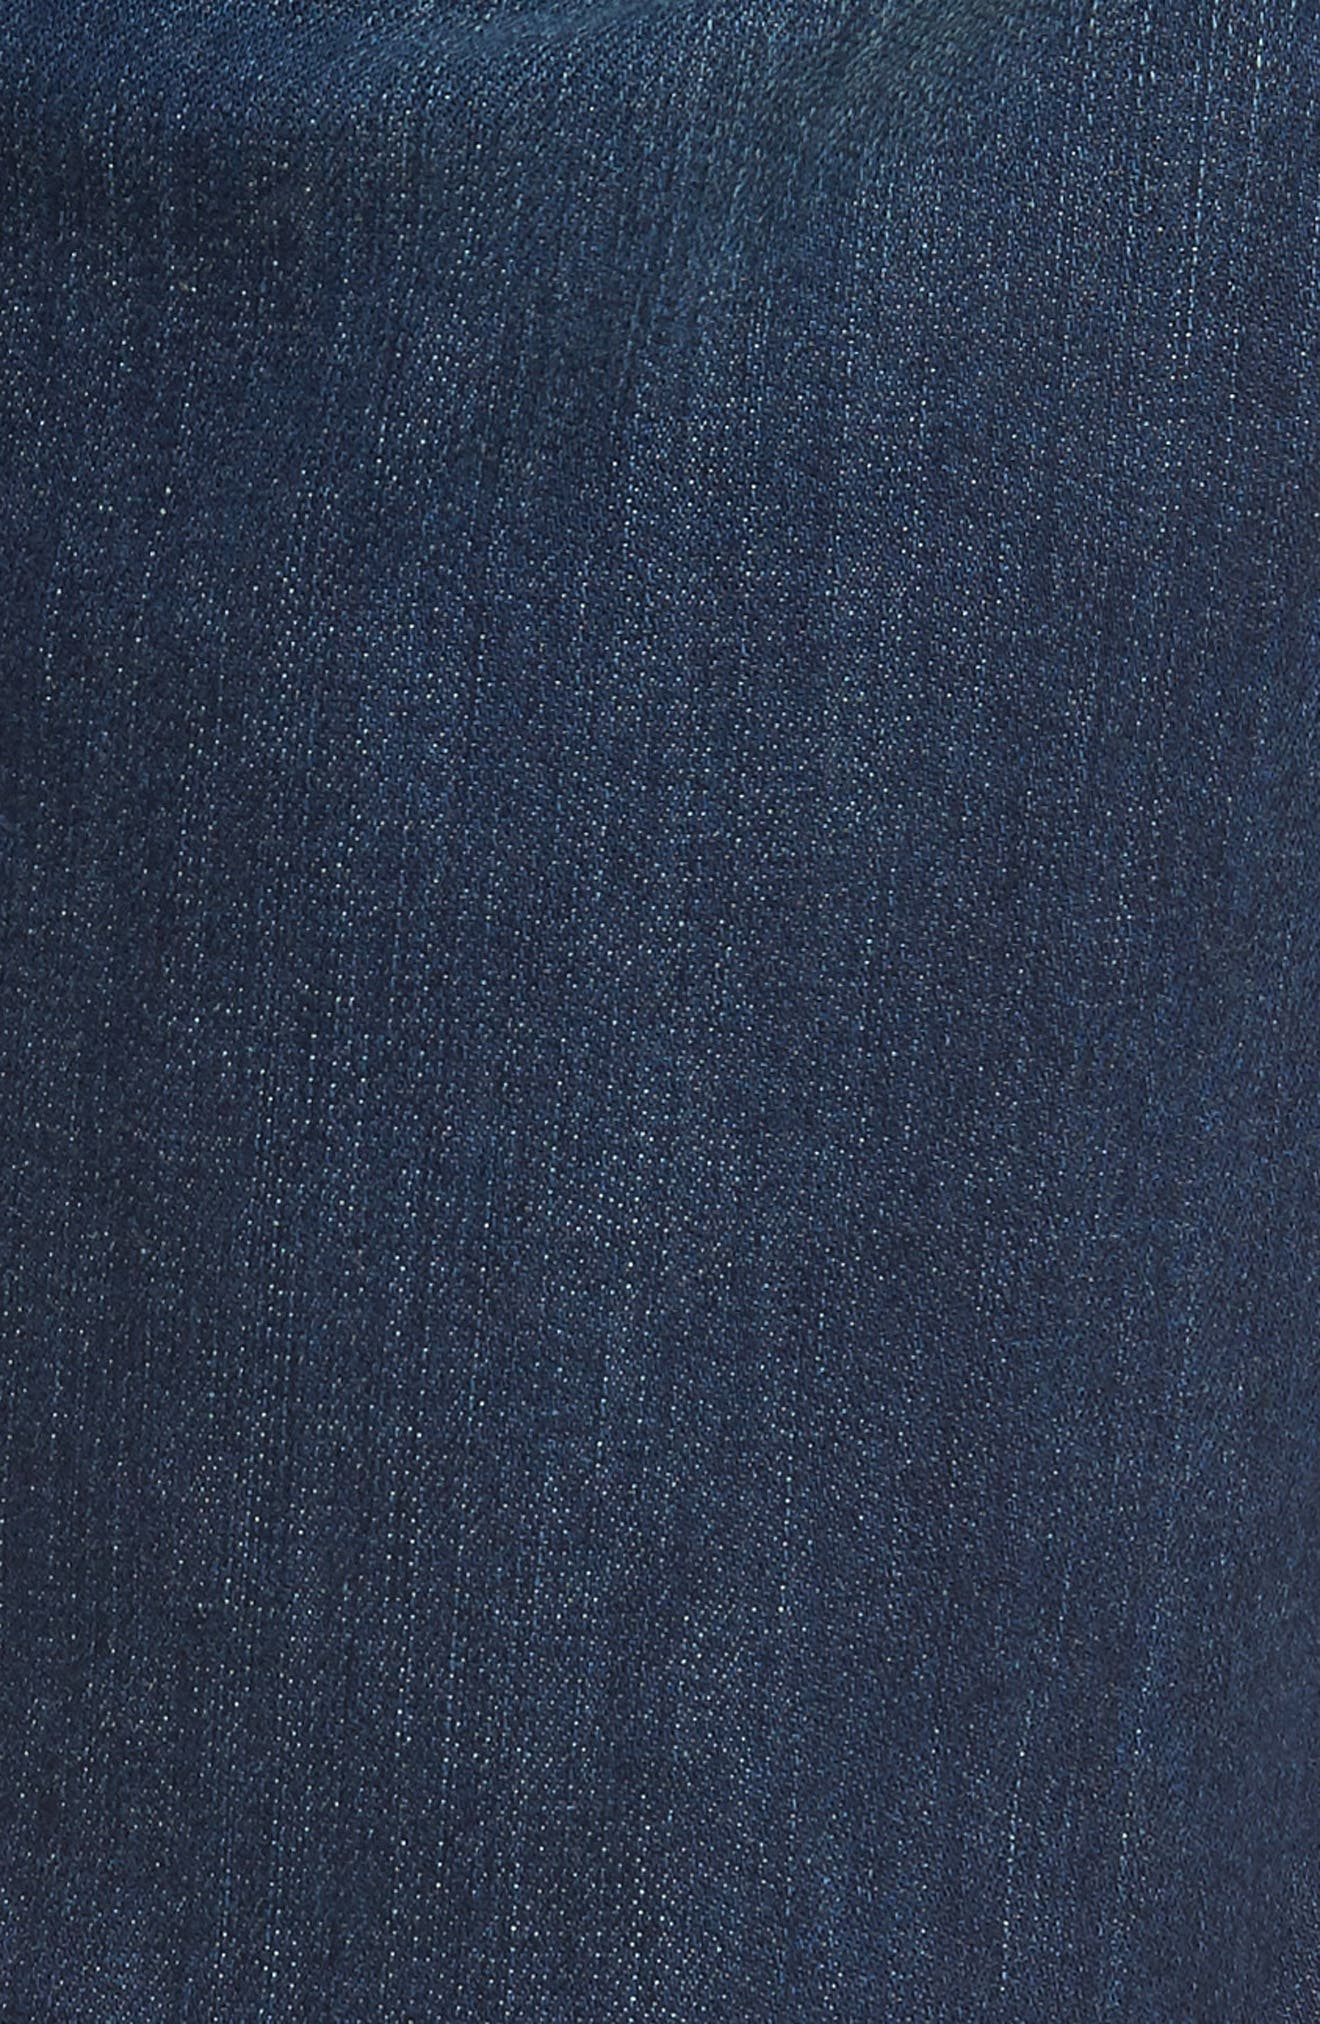 Lennox Slim Fit Jeans,                             Alternate thumbnail 5, color,                             Harlan Destructed